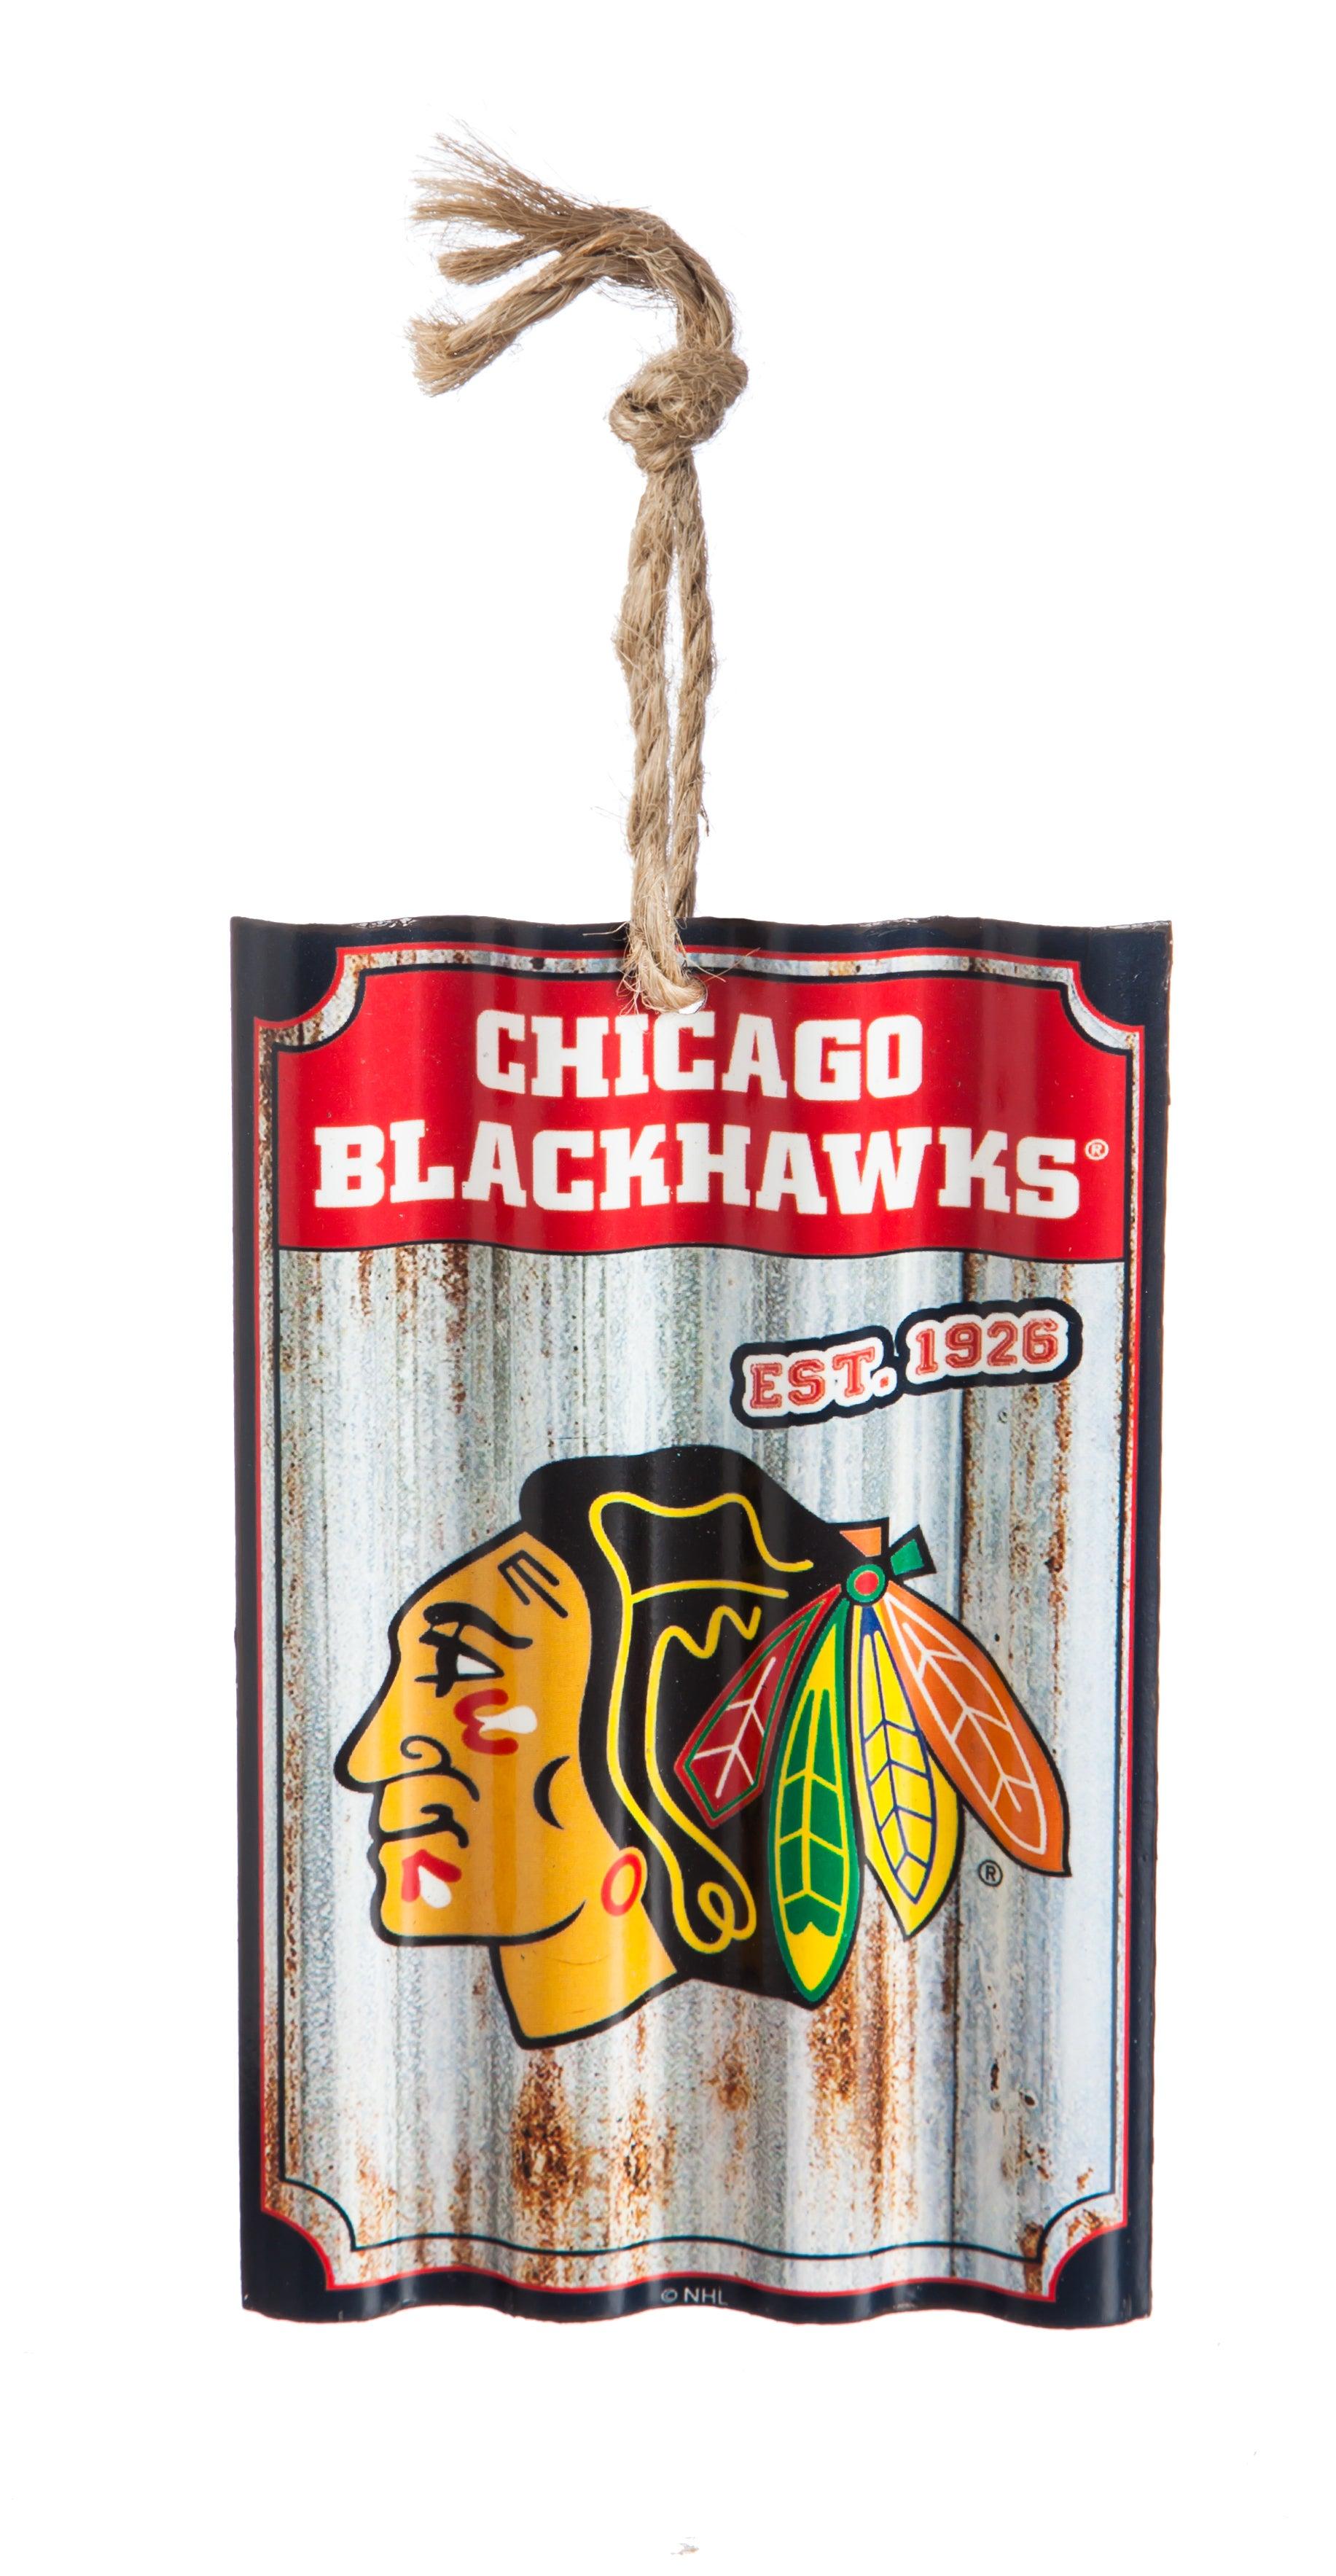 Chicago Blackhawks Corrugated Metal Ornament